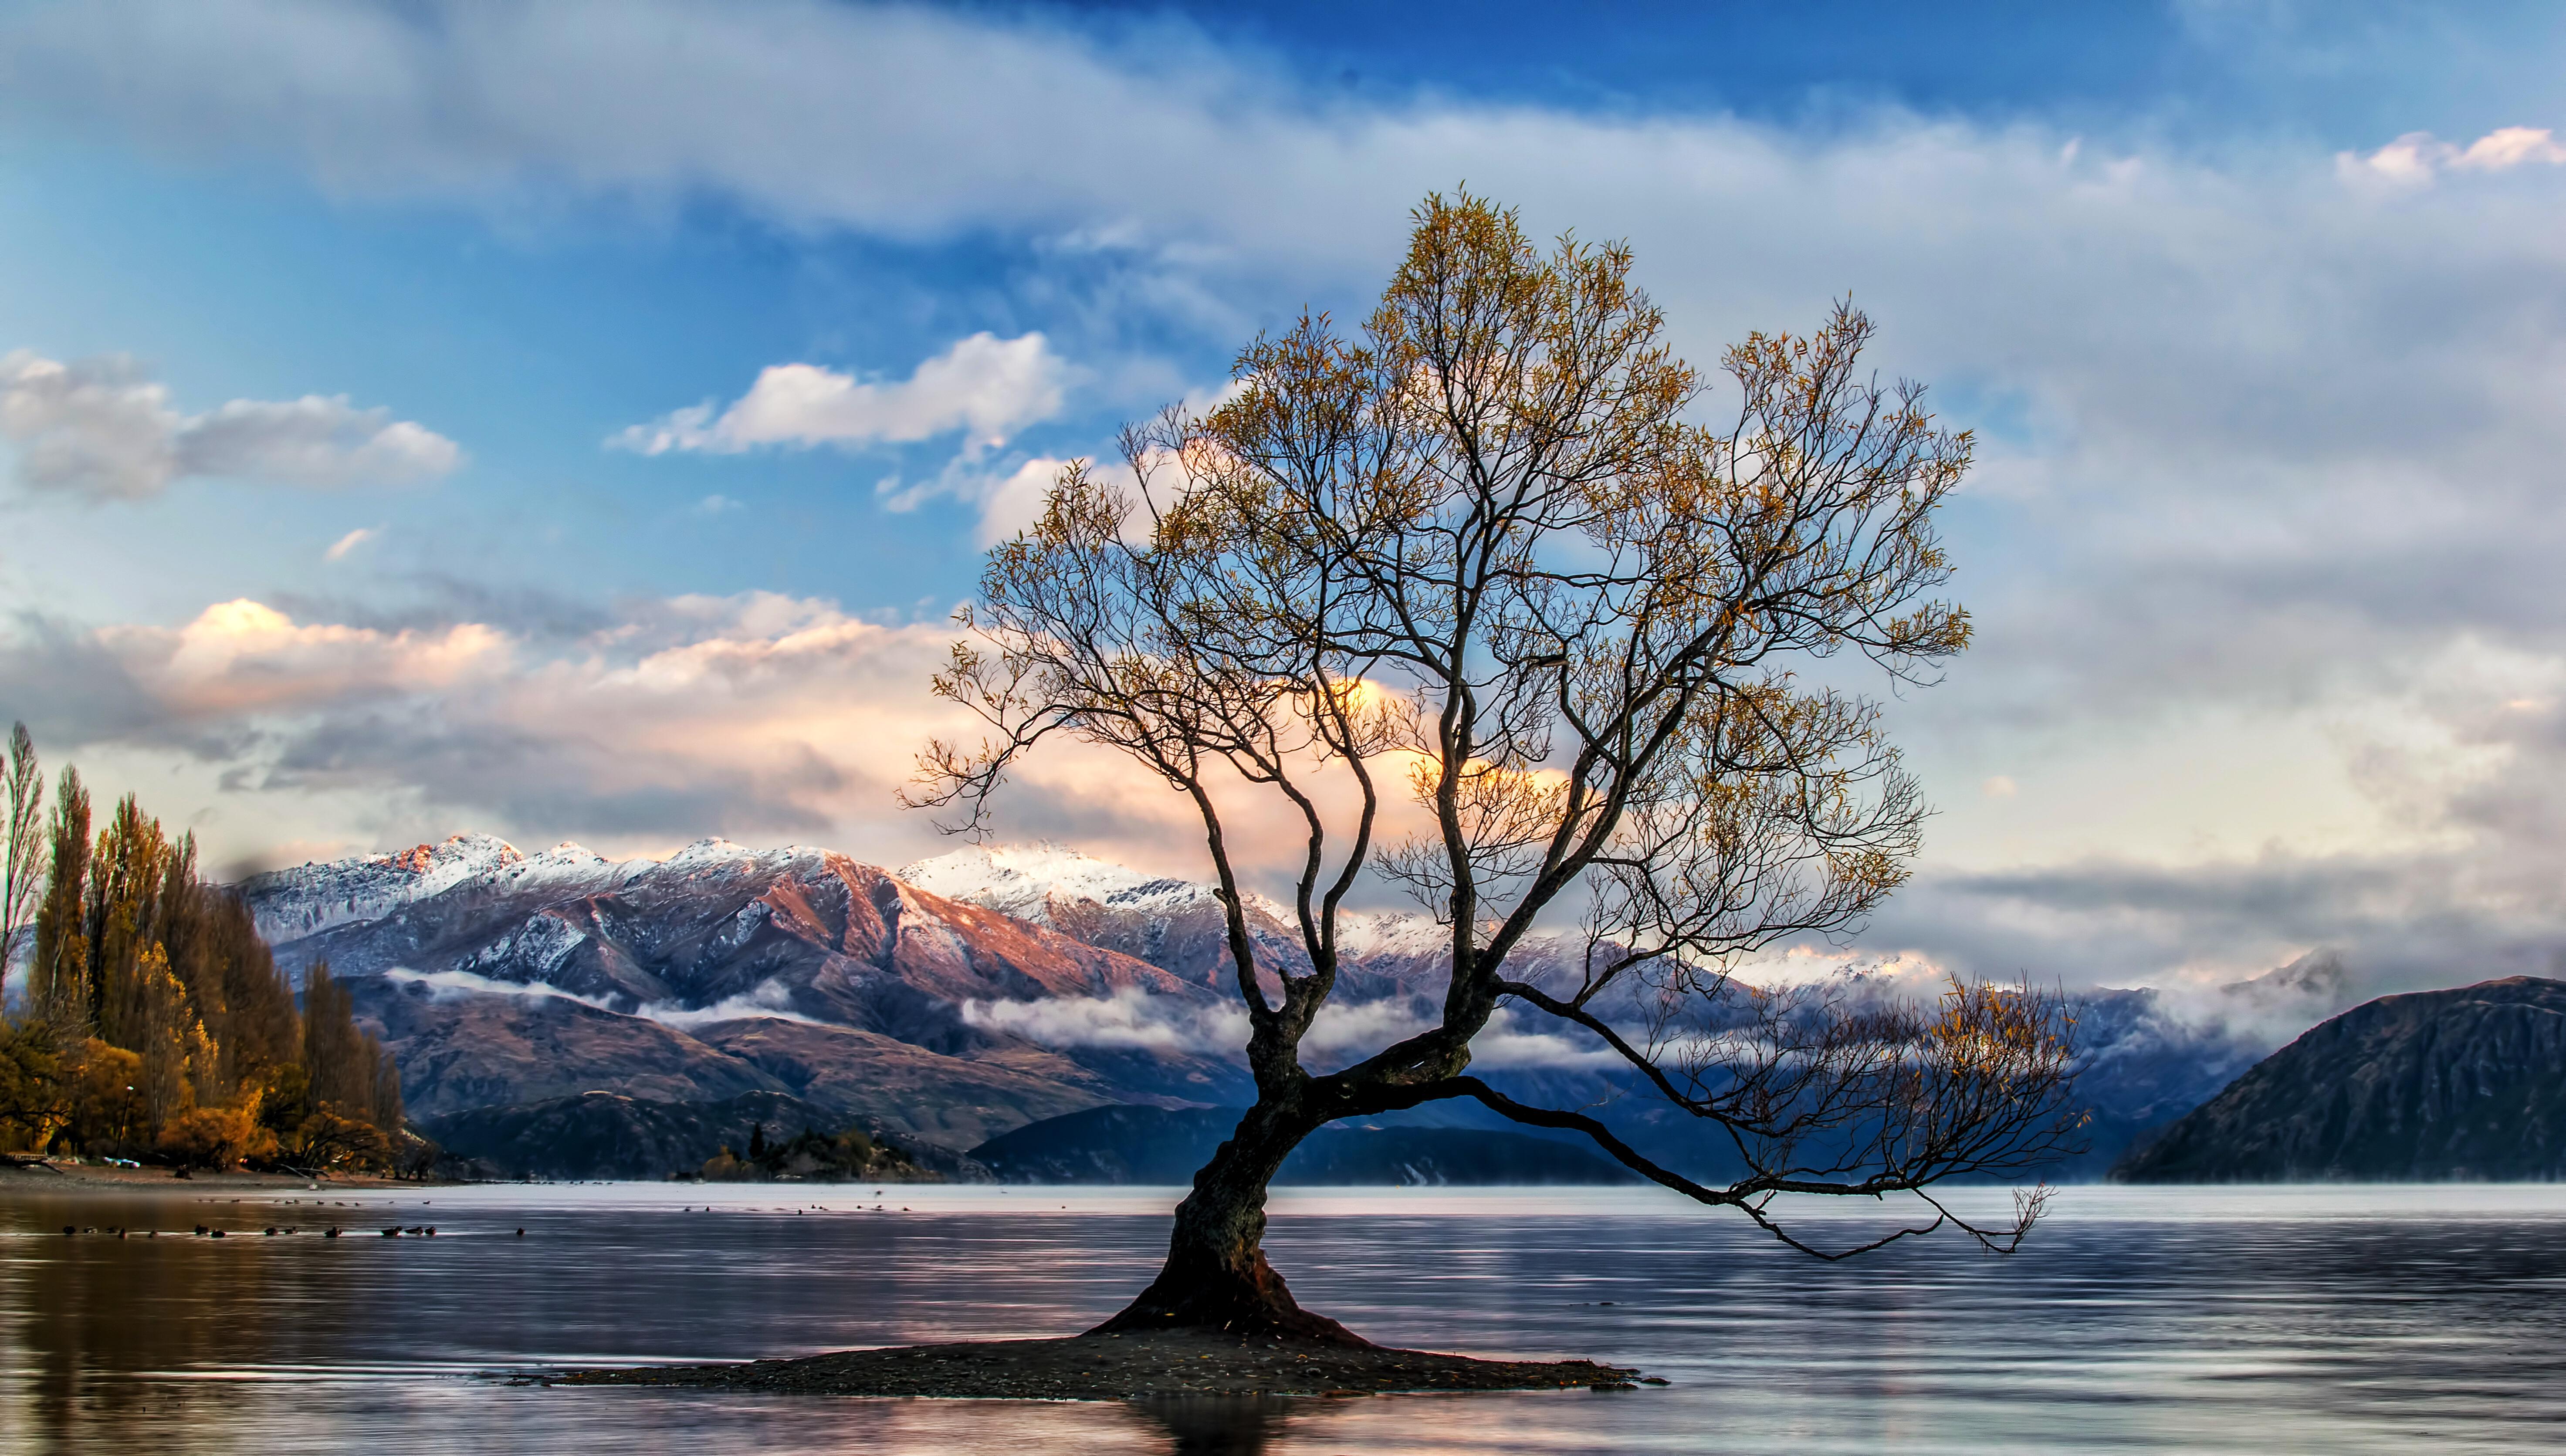 Tree On Lake Wallpapers Wallpaper Cave Hd wallpaper lake tree trunk mountain